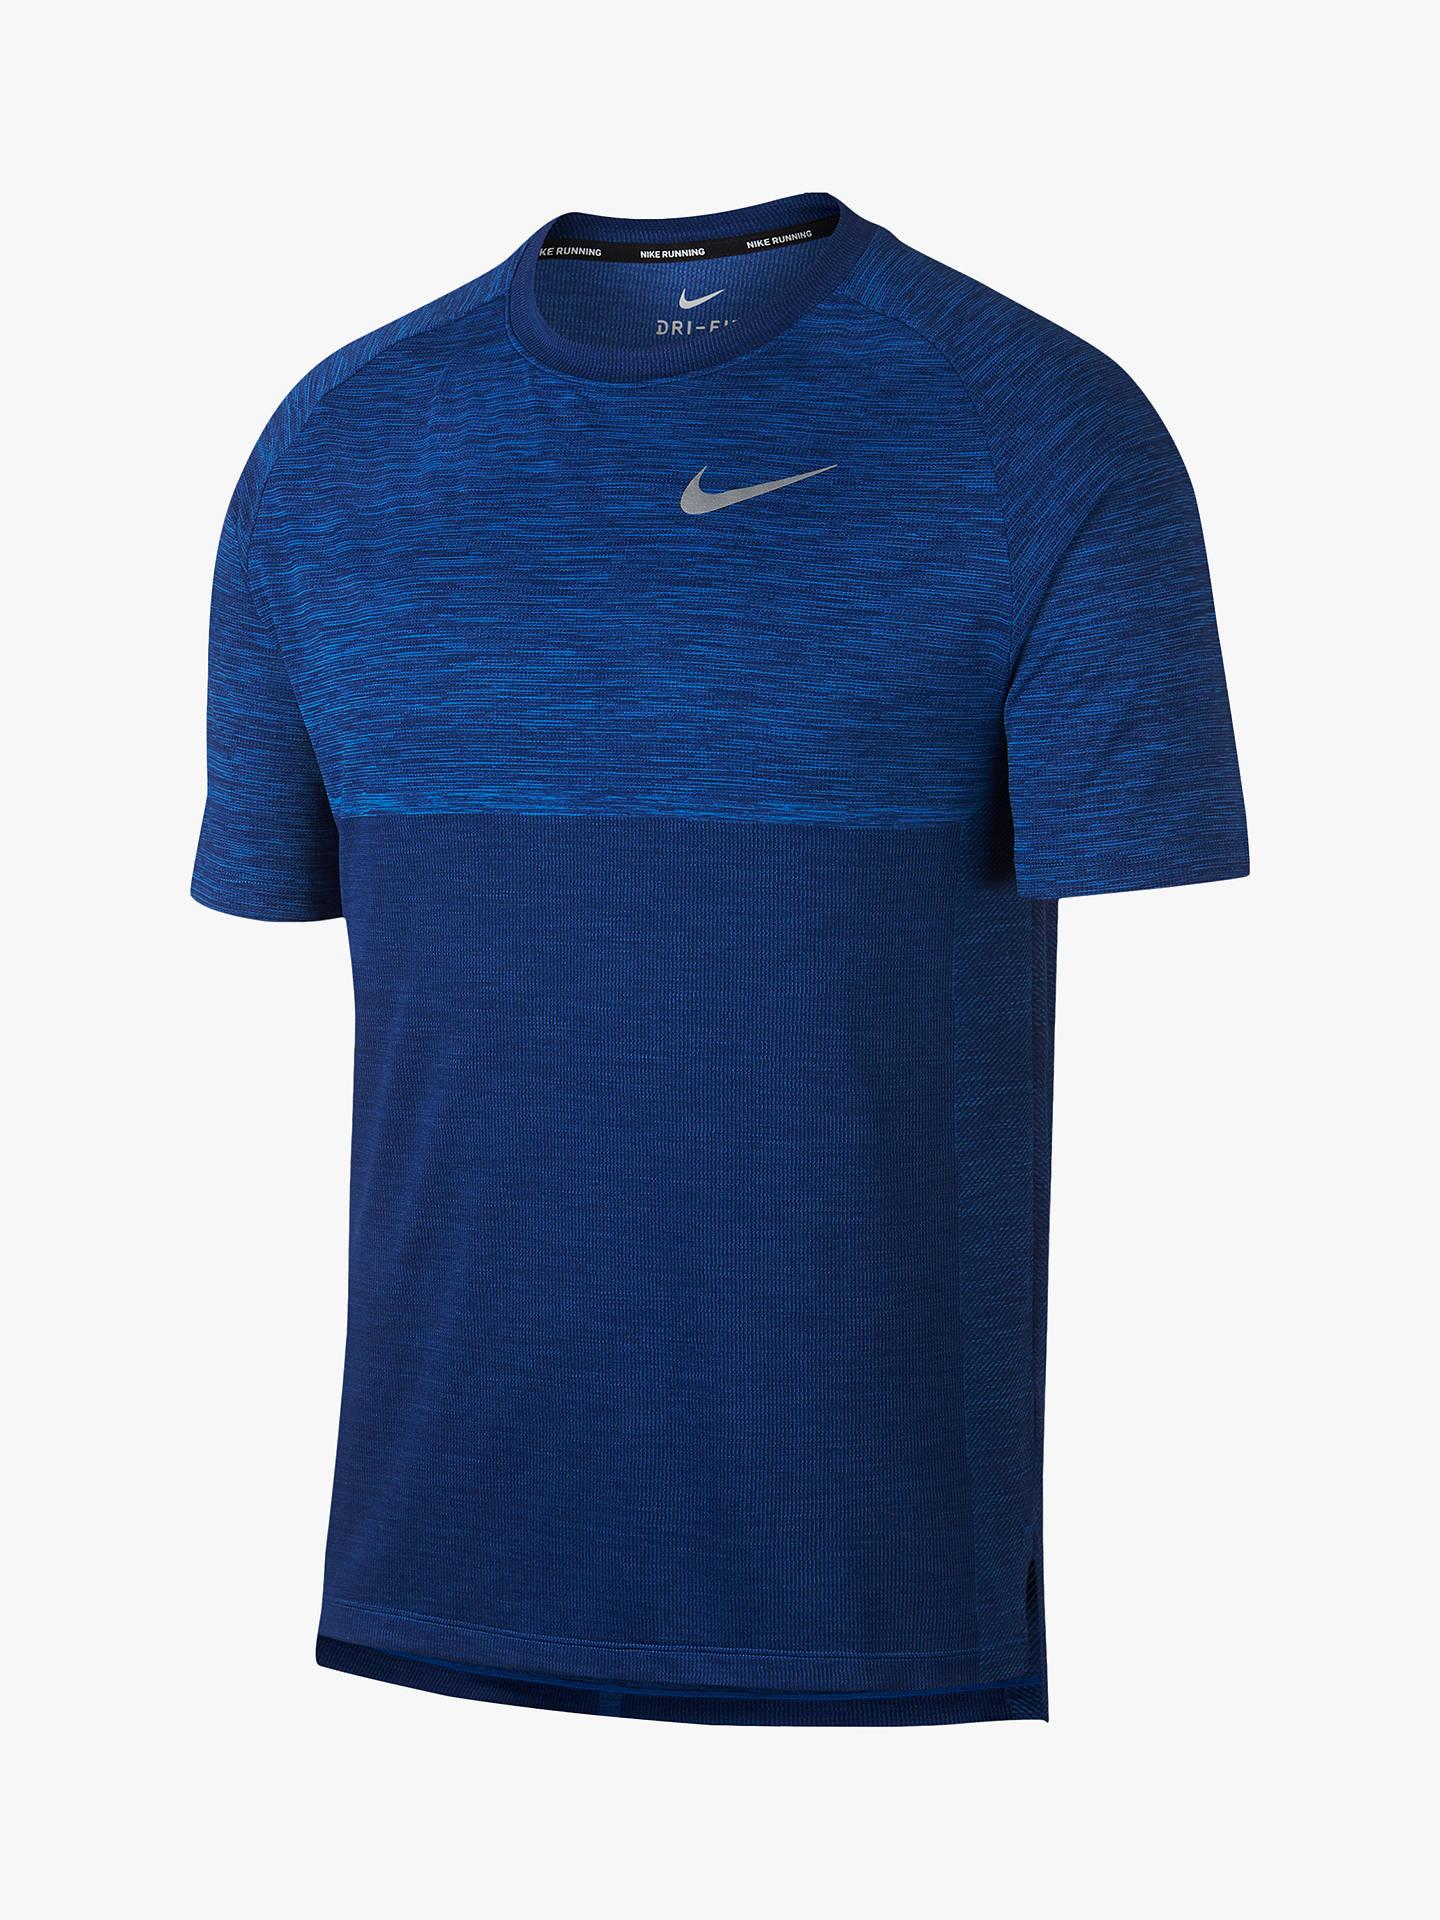 f912aad0 Buy Nike Dry-FIT Medallist Running Top, Signal Blue, L Online at johnlewis  ...